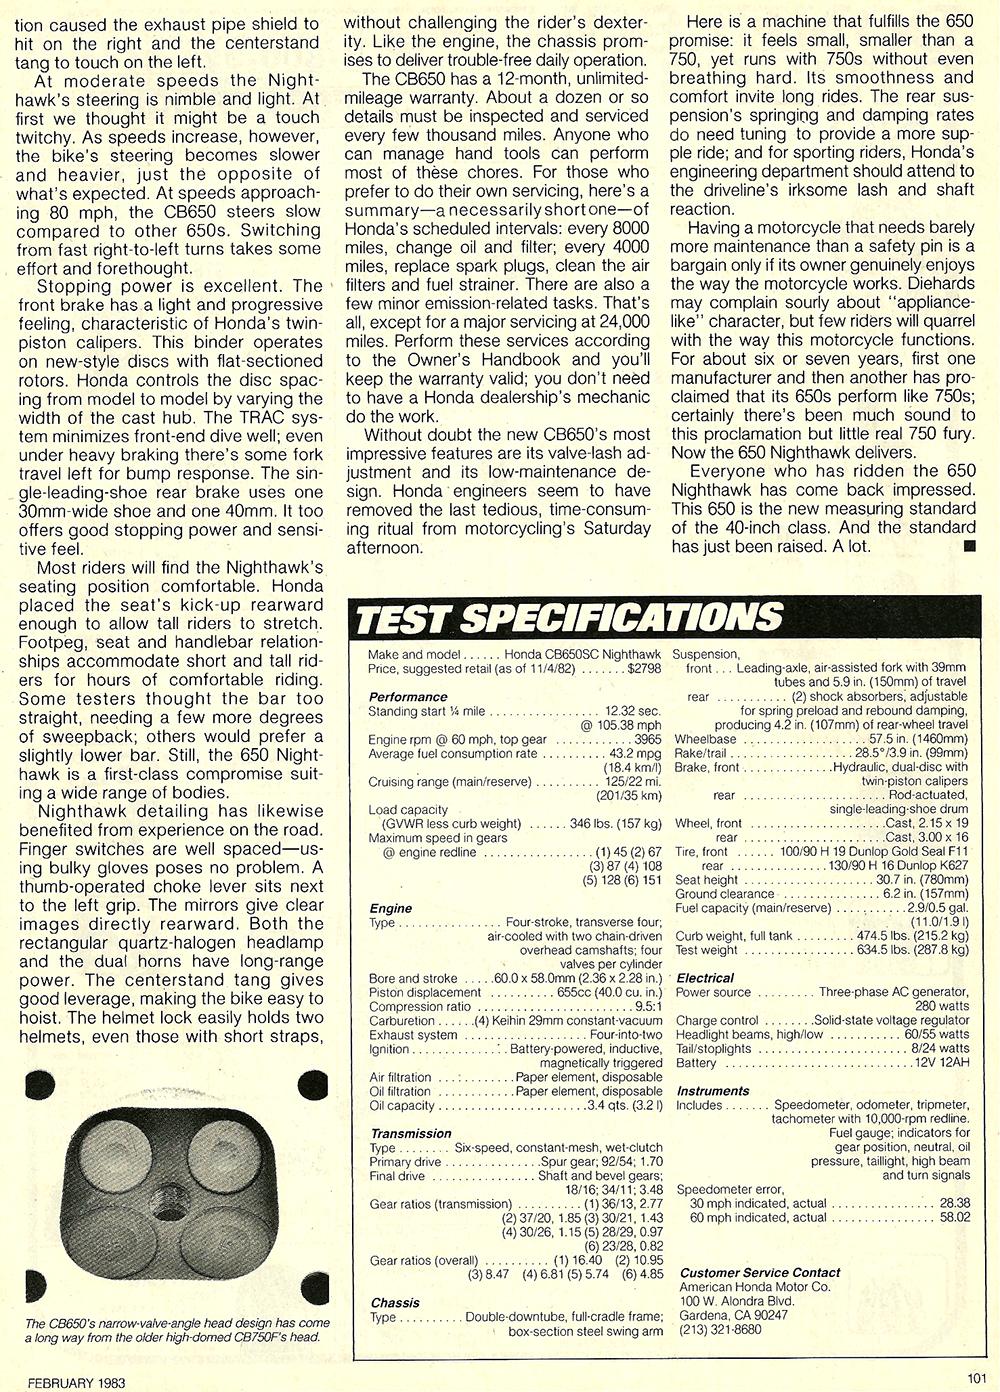 1983 Honda CB650SC Nighthawk road test 8.jpg